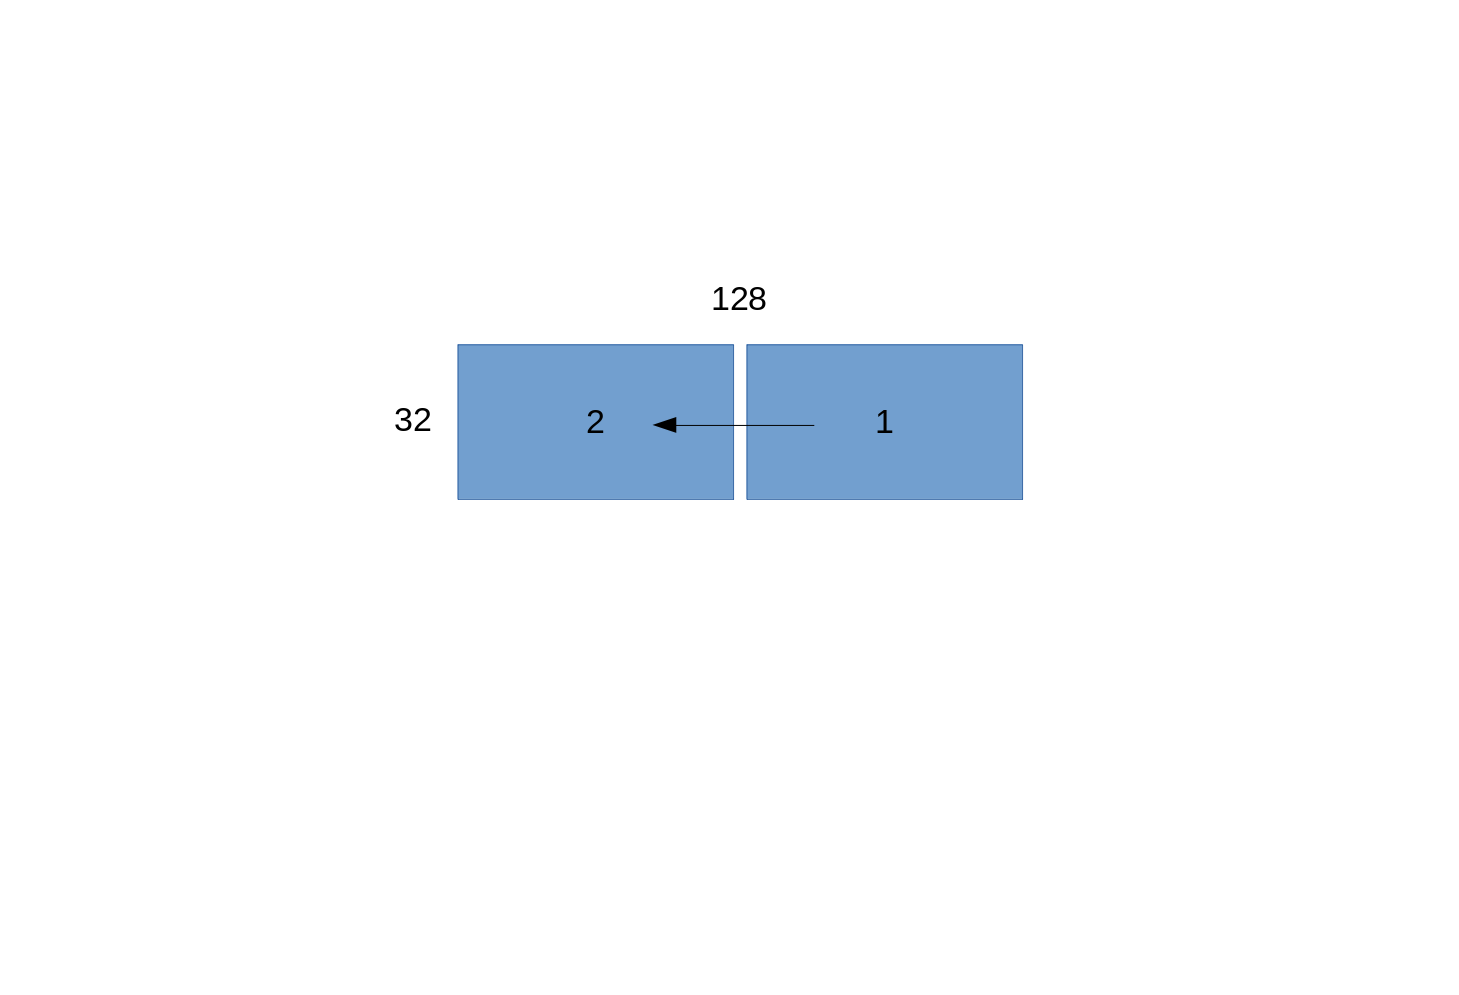 led_matrices_ksnip_20210128-111853.png